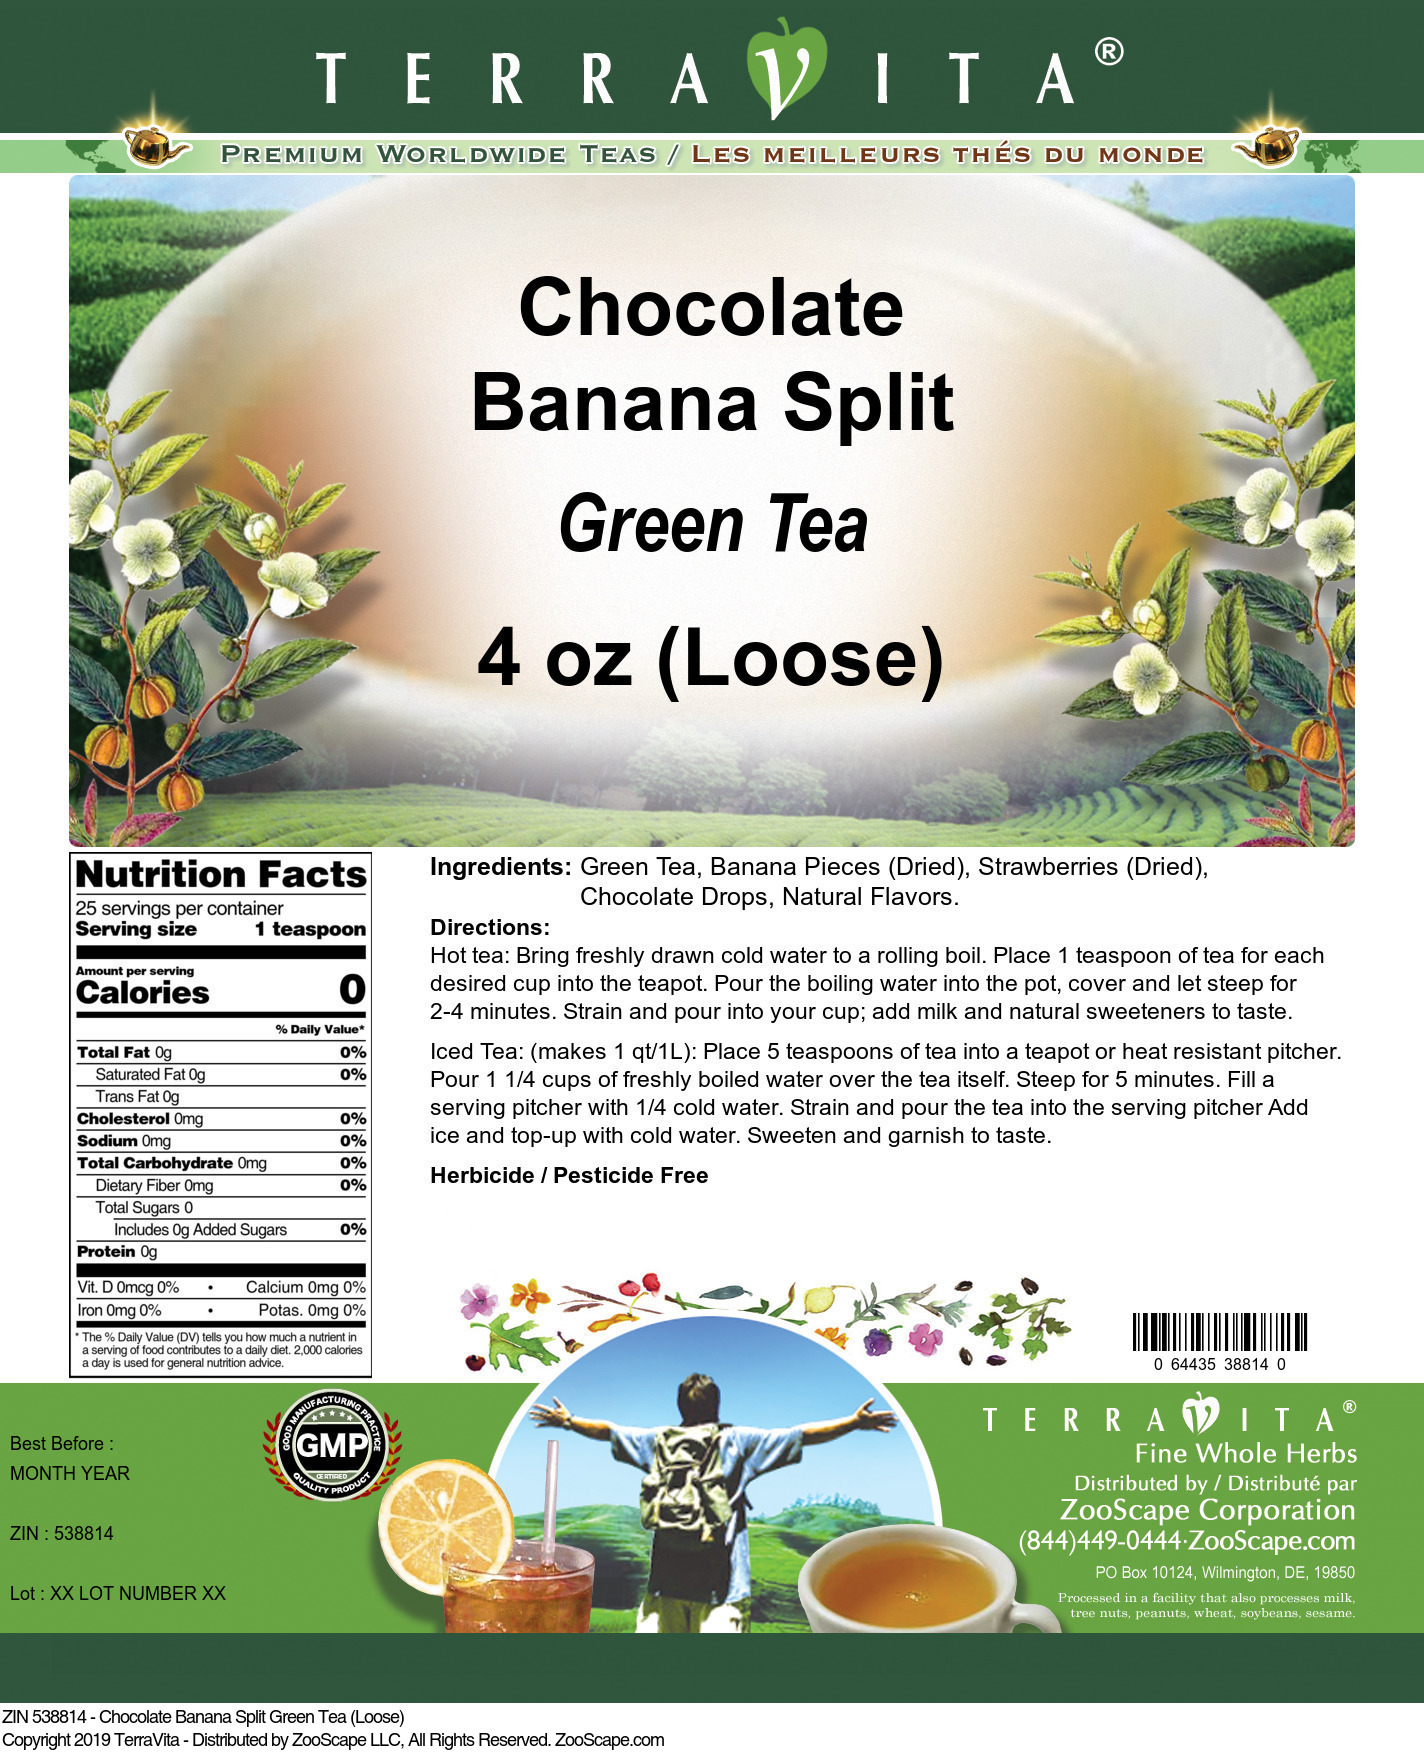 Chocolate Banana Split Green Tea